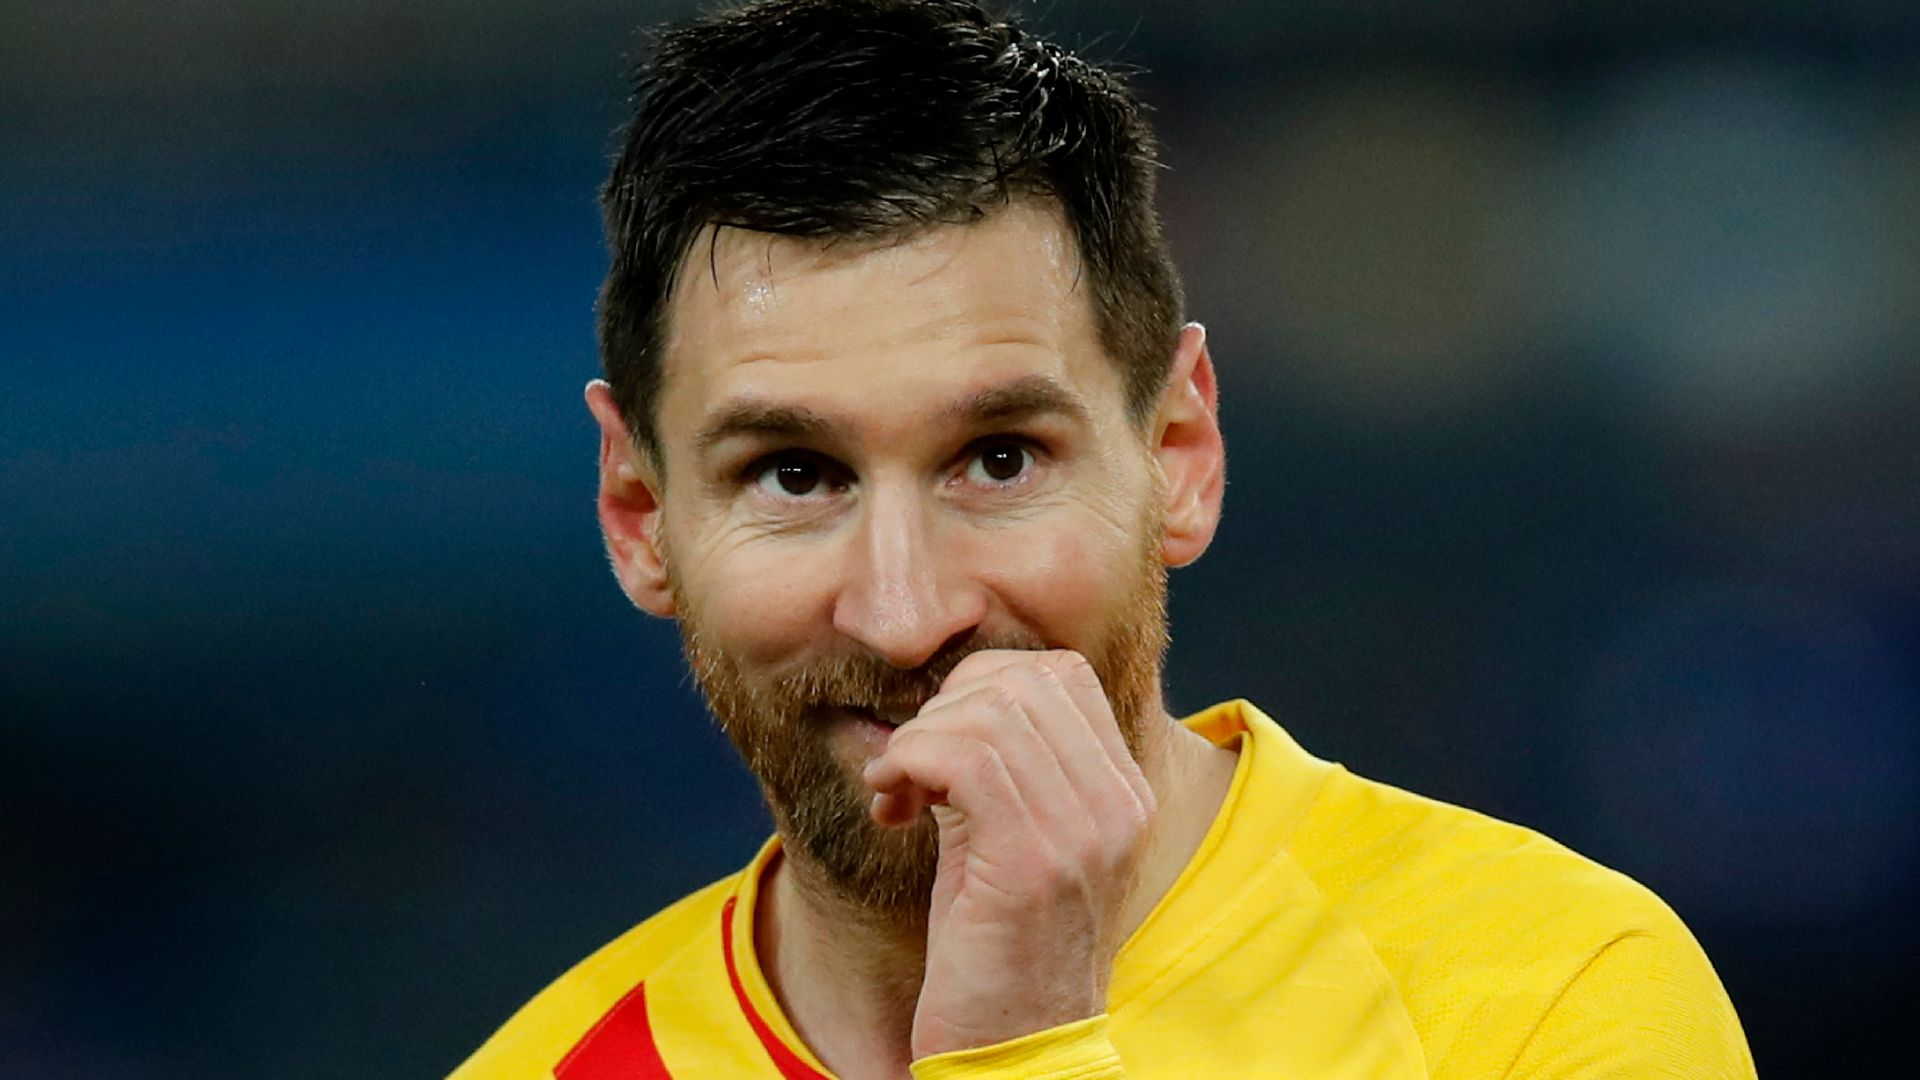 Koeman: Messi knows Barca have great future